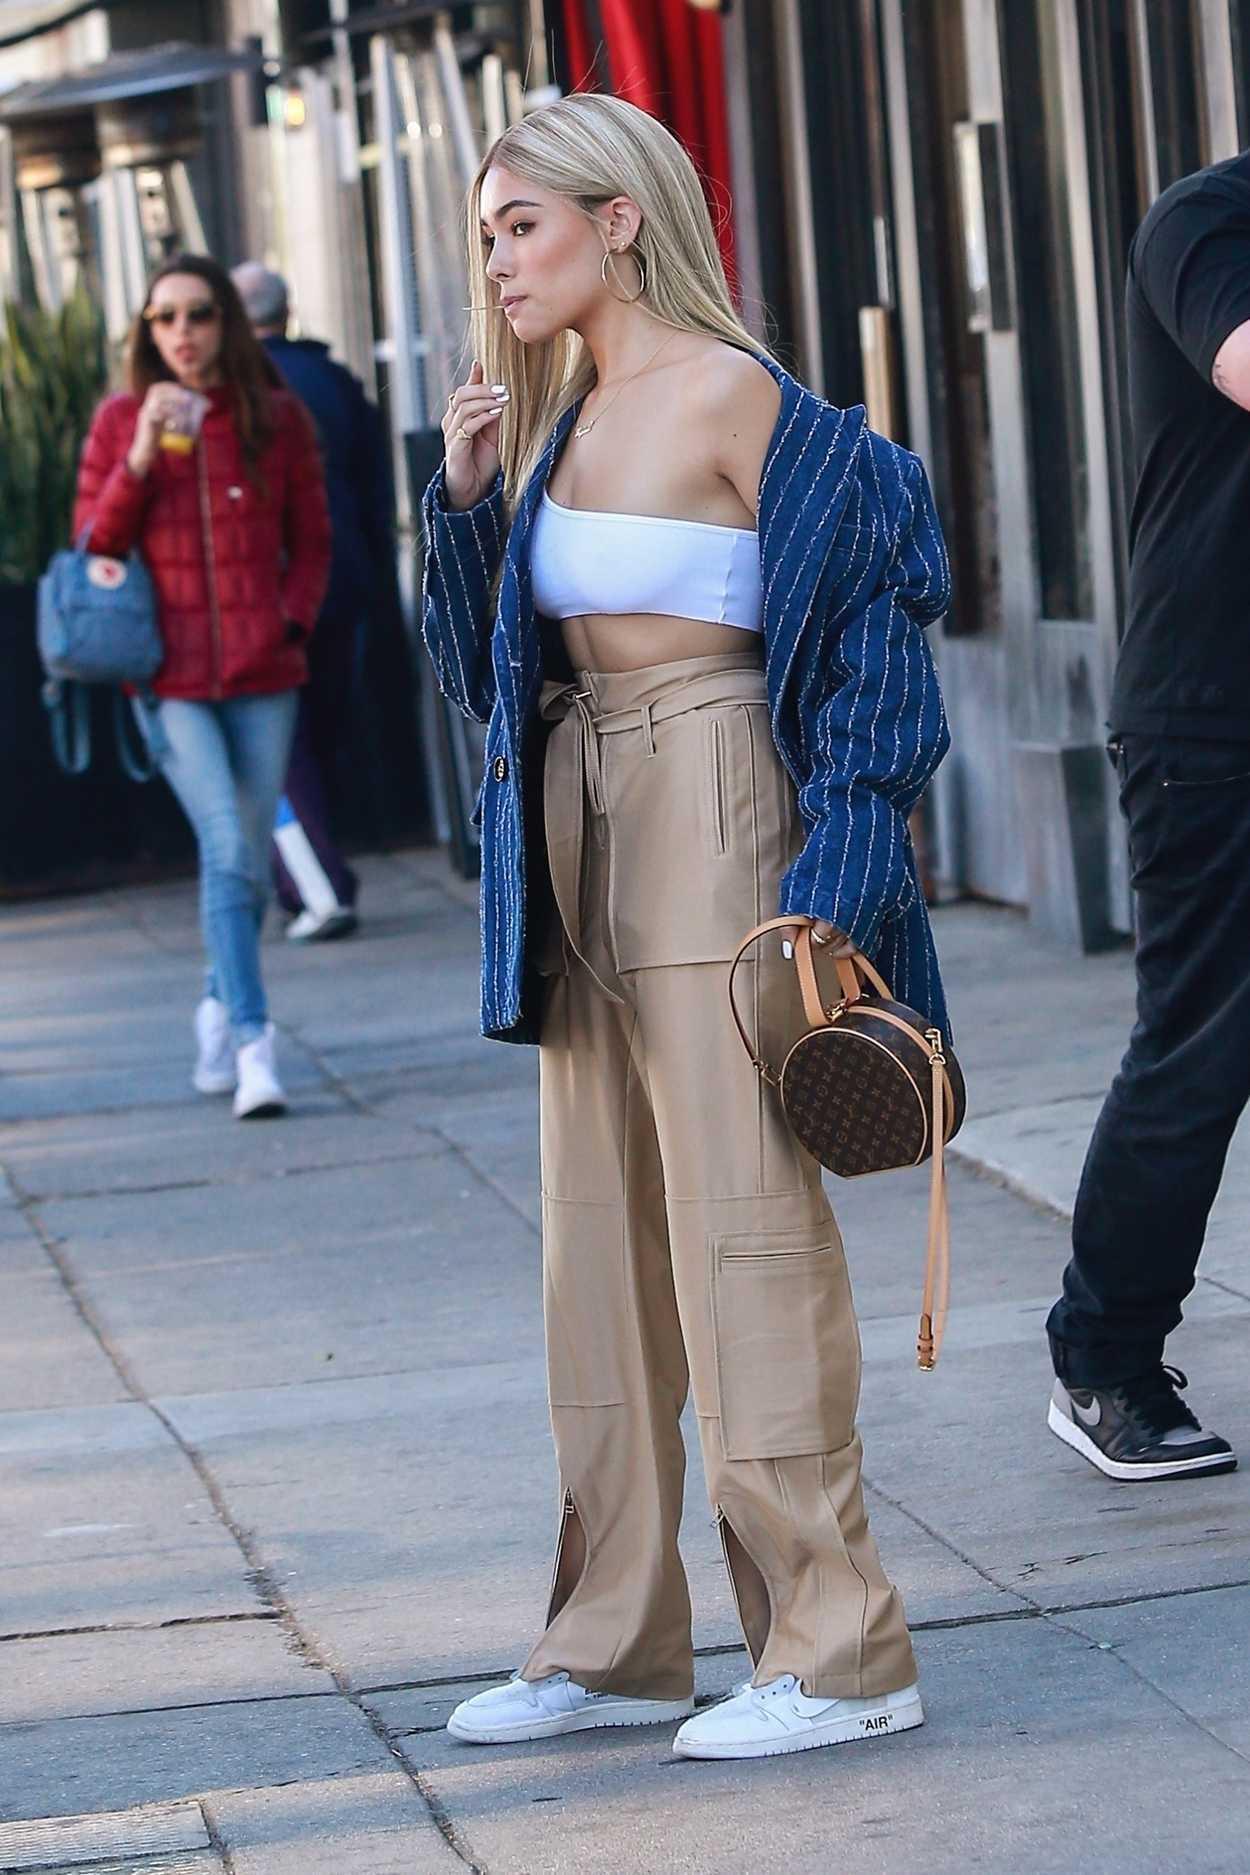 Madison Beer Debuts Her New Platinum Blonde Hair In La 12